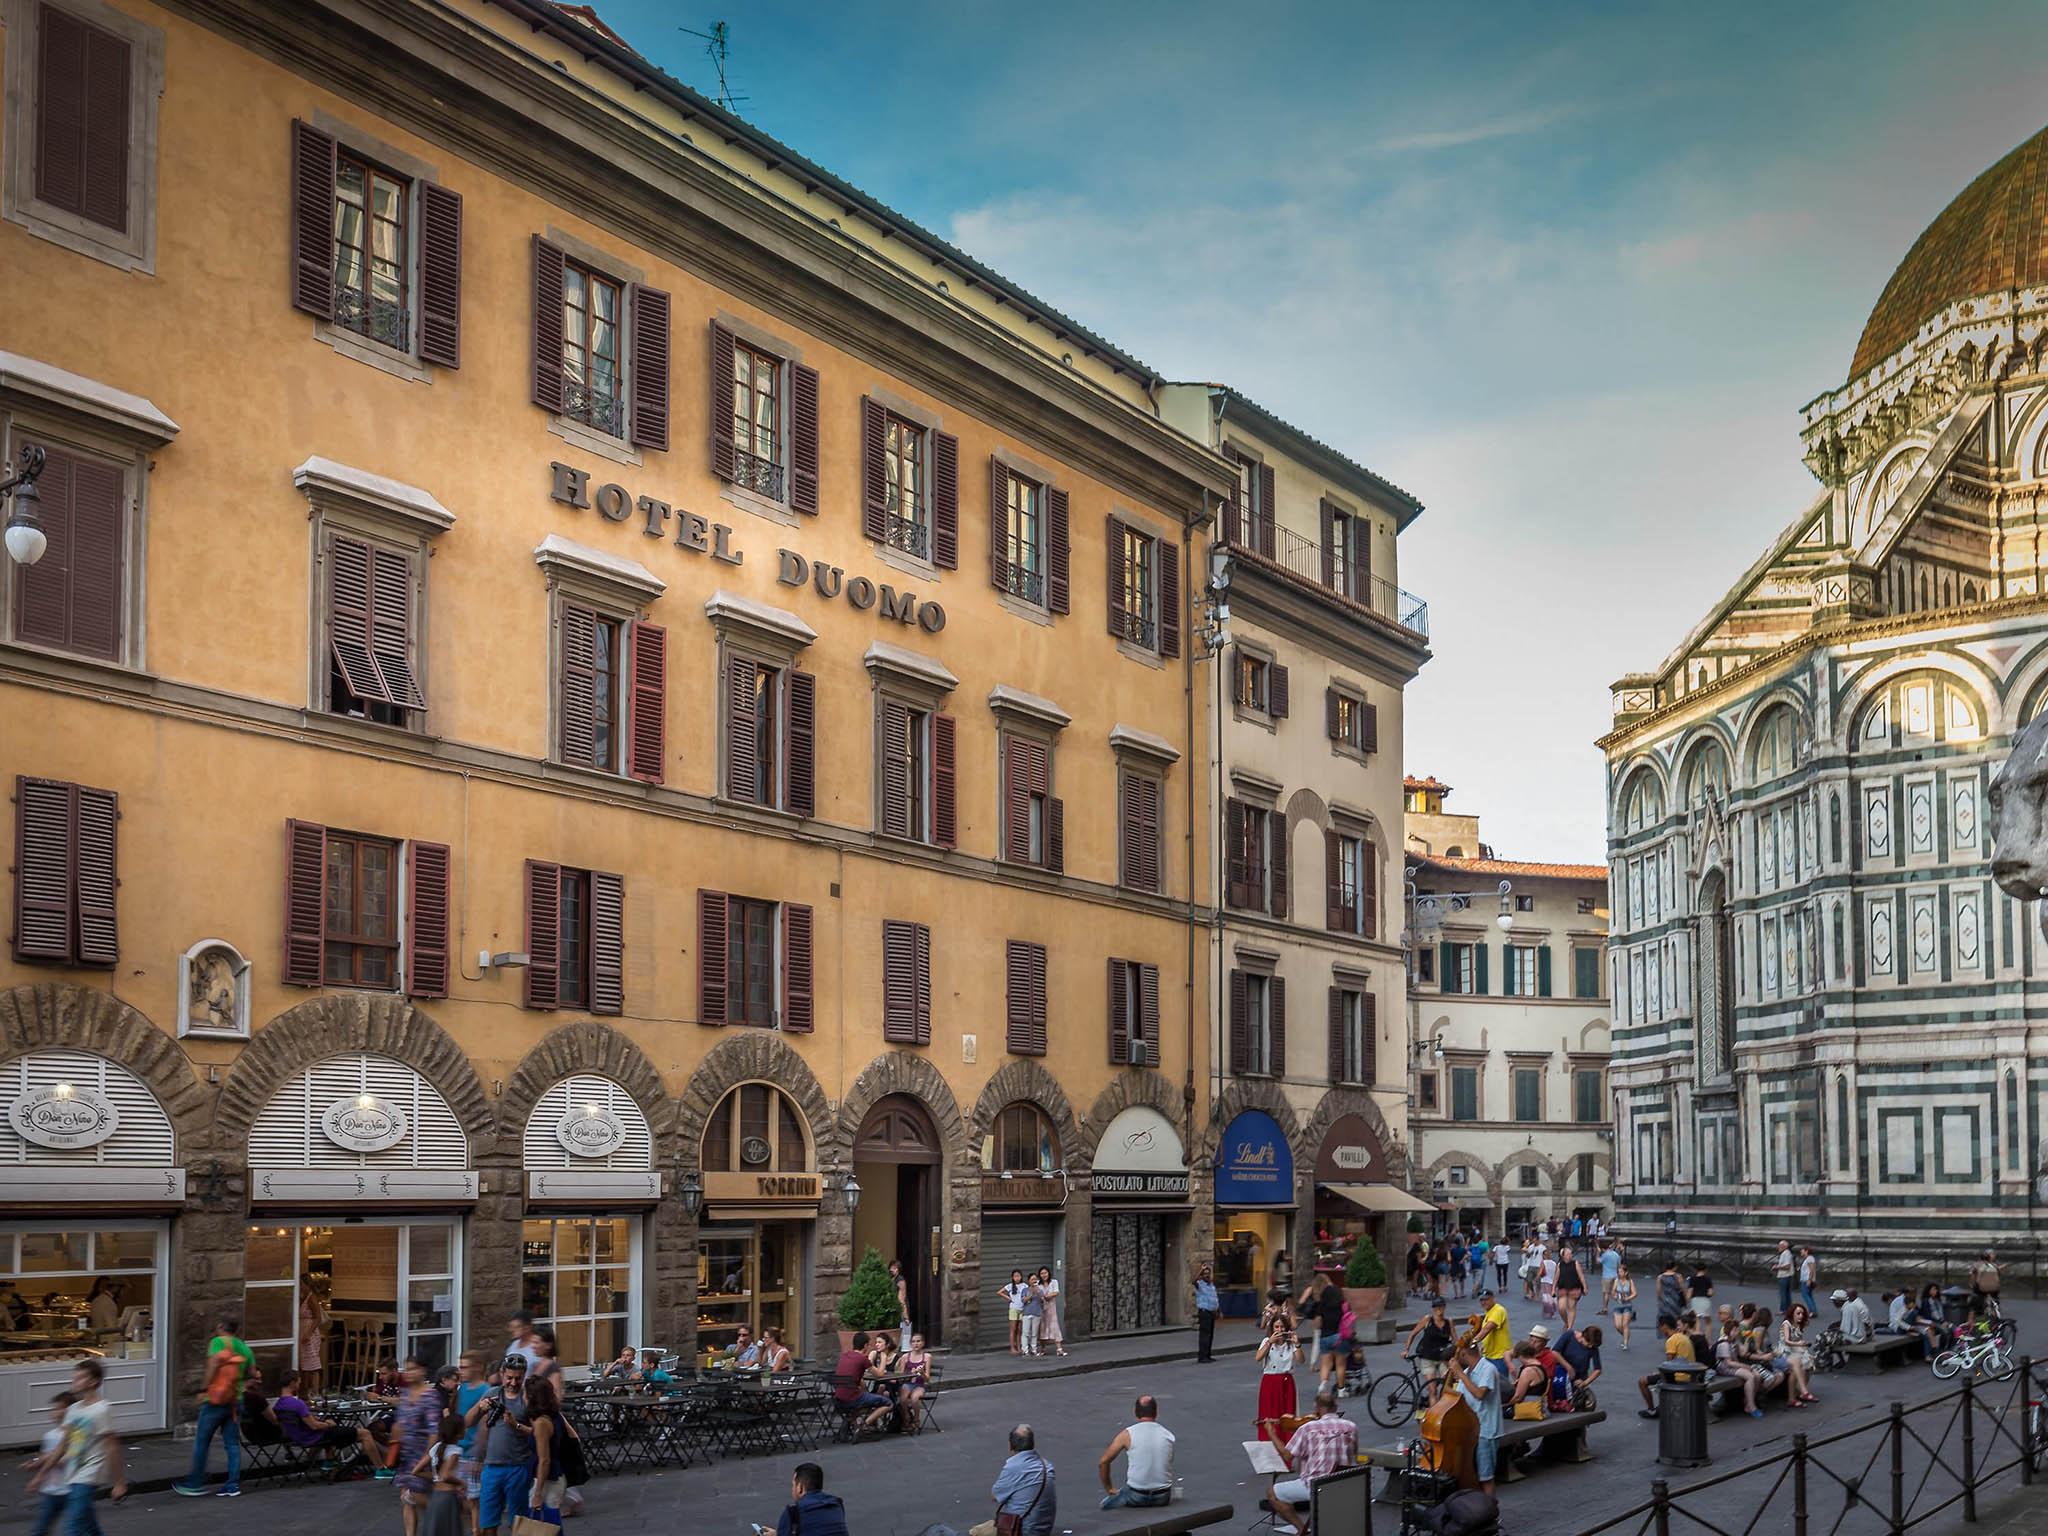 Firenze casino